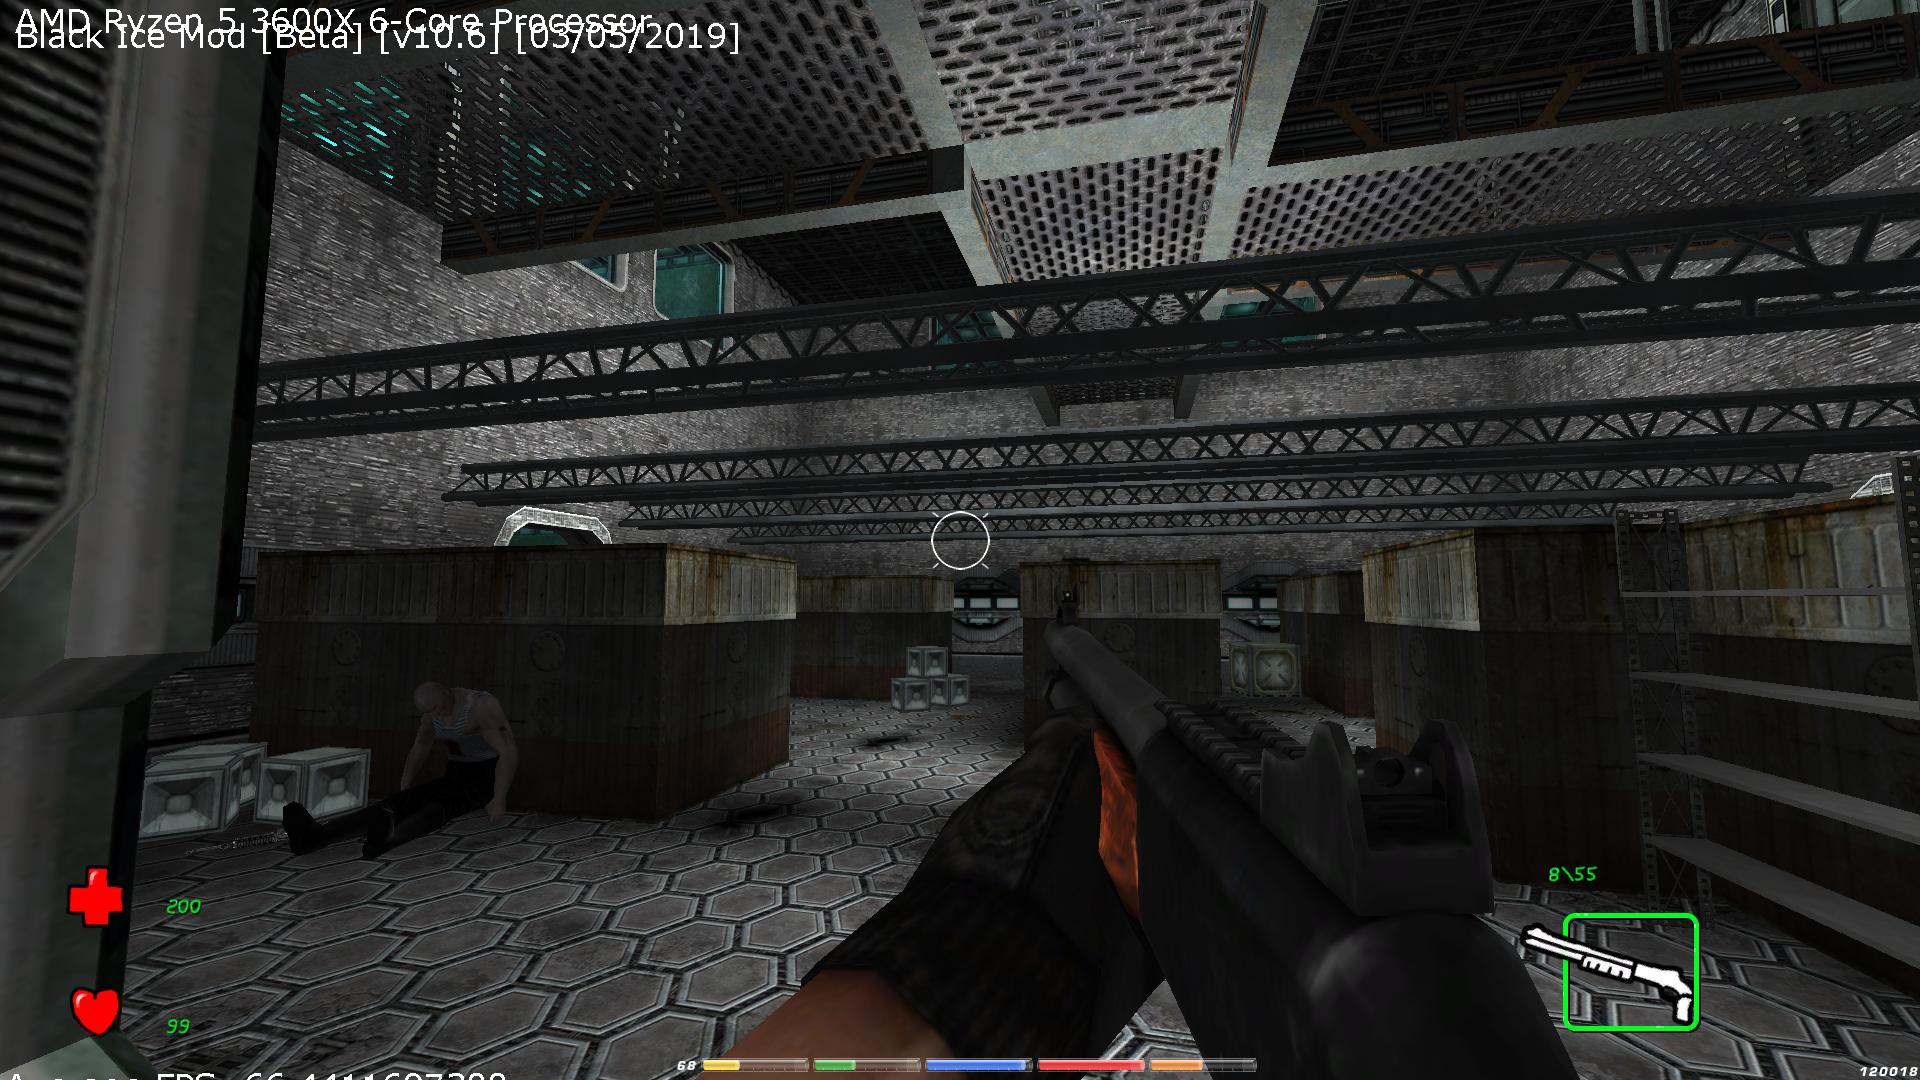 FPSC Game 2020 03 13 20 04 20